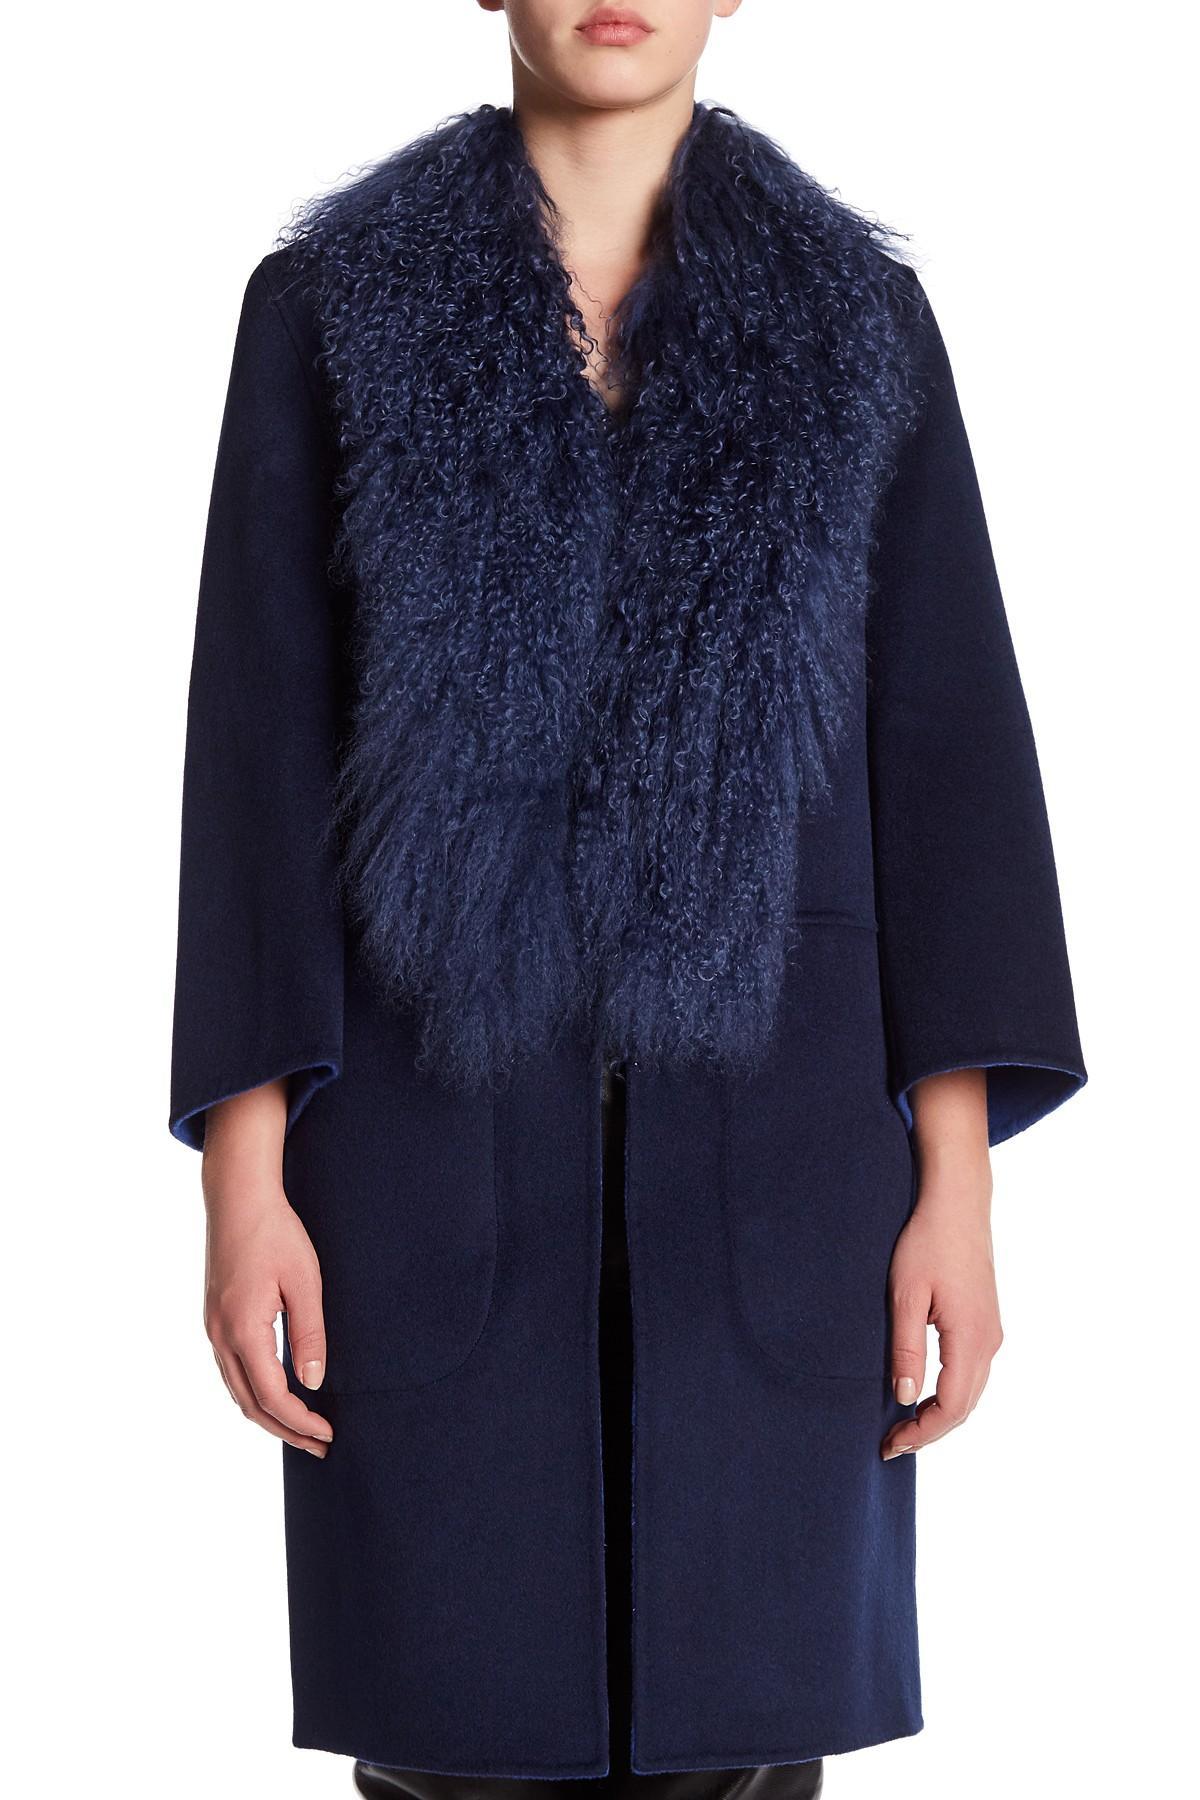 Zac Zac Posen Blue Lauren Mid Length Wool & Genuine Mongolian Lamb Fur  Reversible Coat